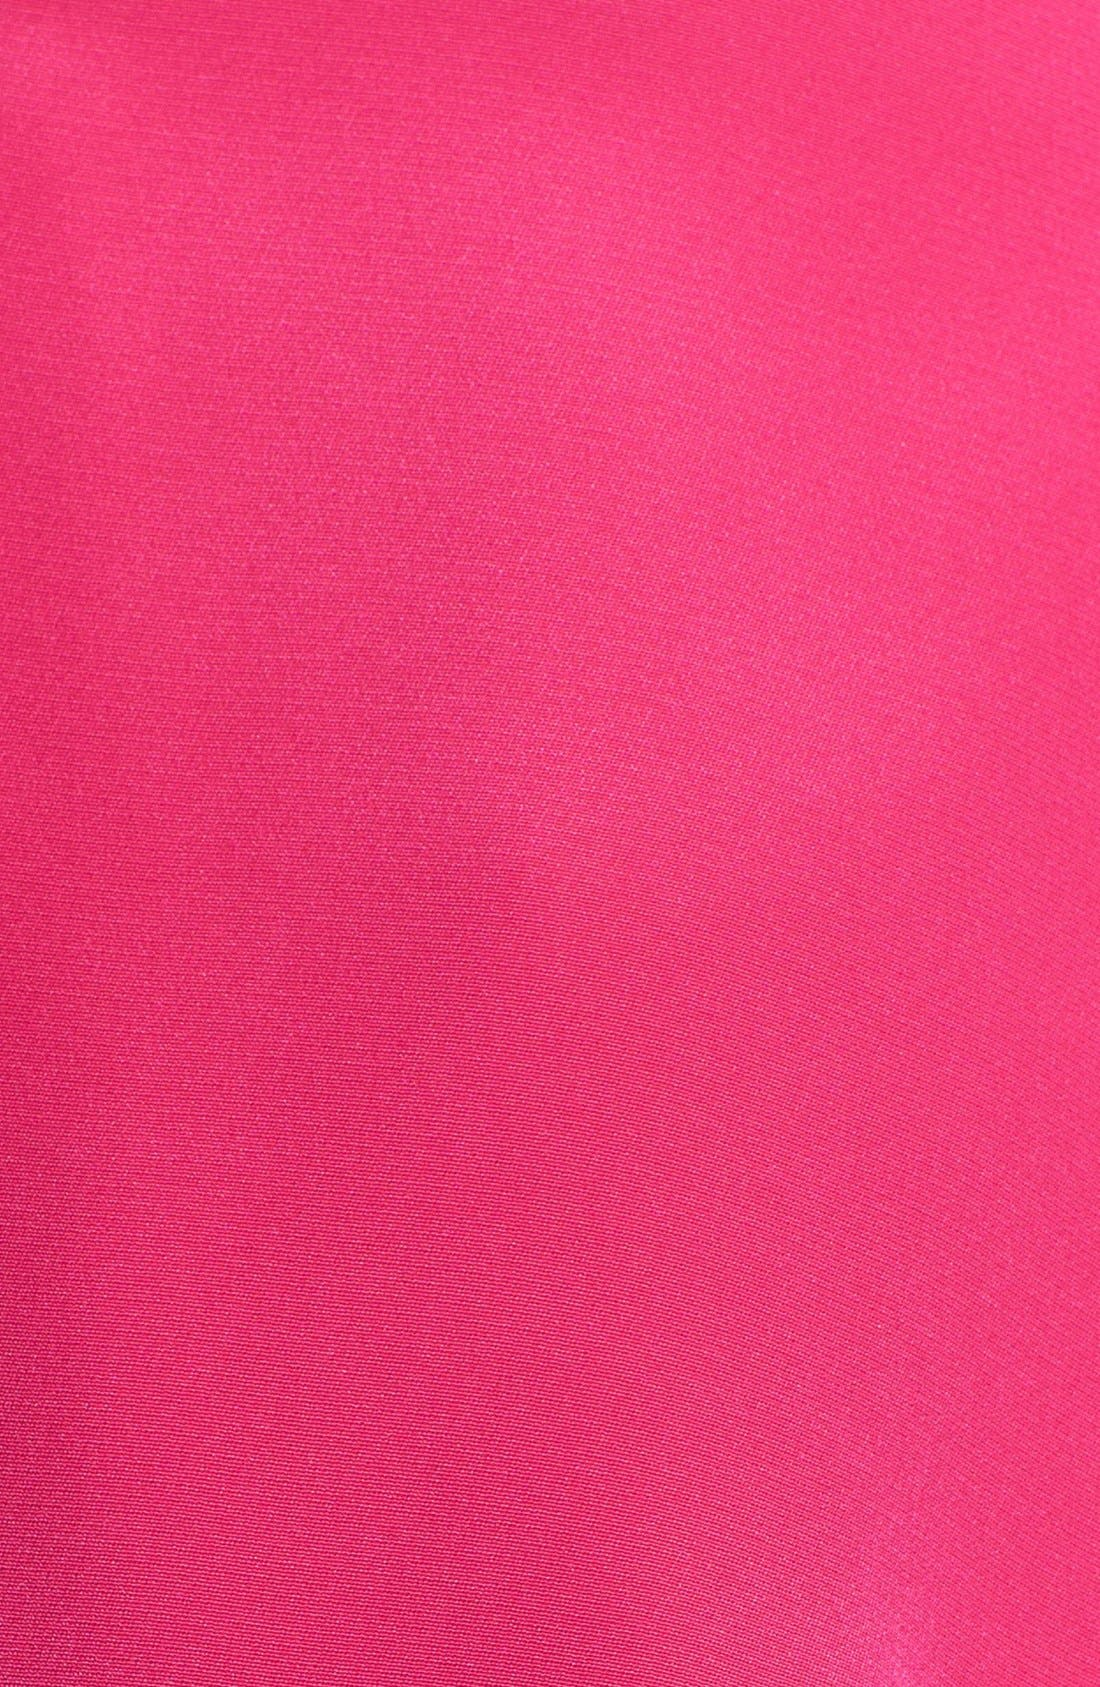 Alternate Image 3  - Rebecca Minkoff 'Stam' Peplum Silk Sheath Dress